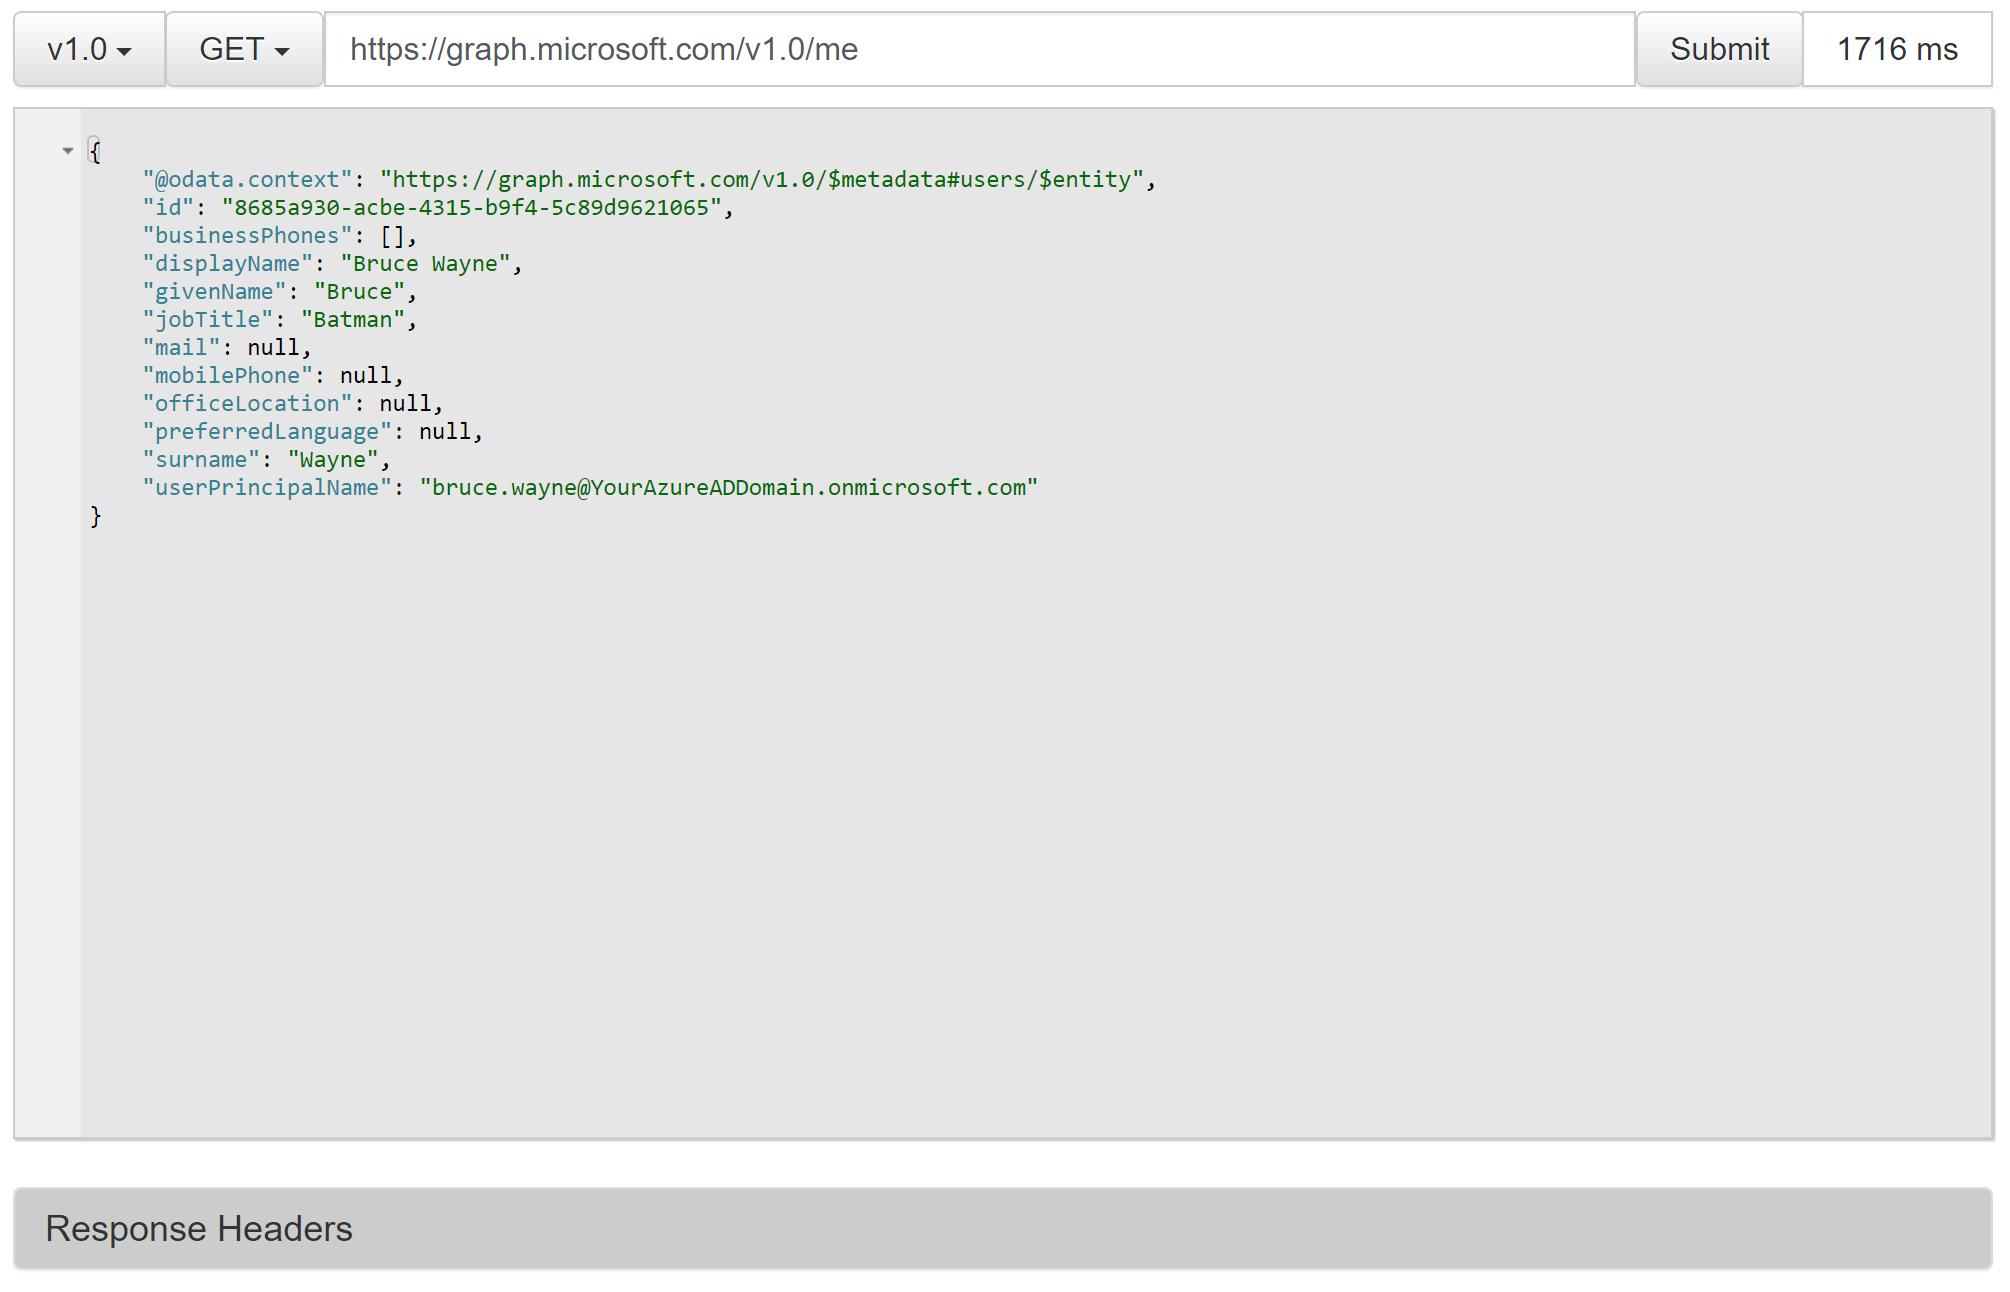 Microsoft Graph Explorer V1.0 Endpoint